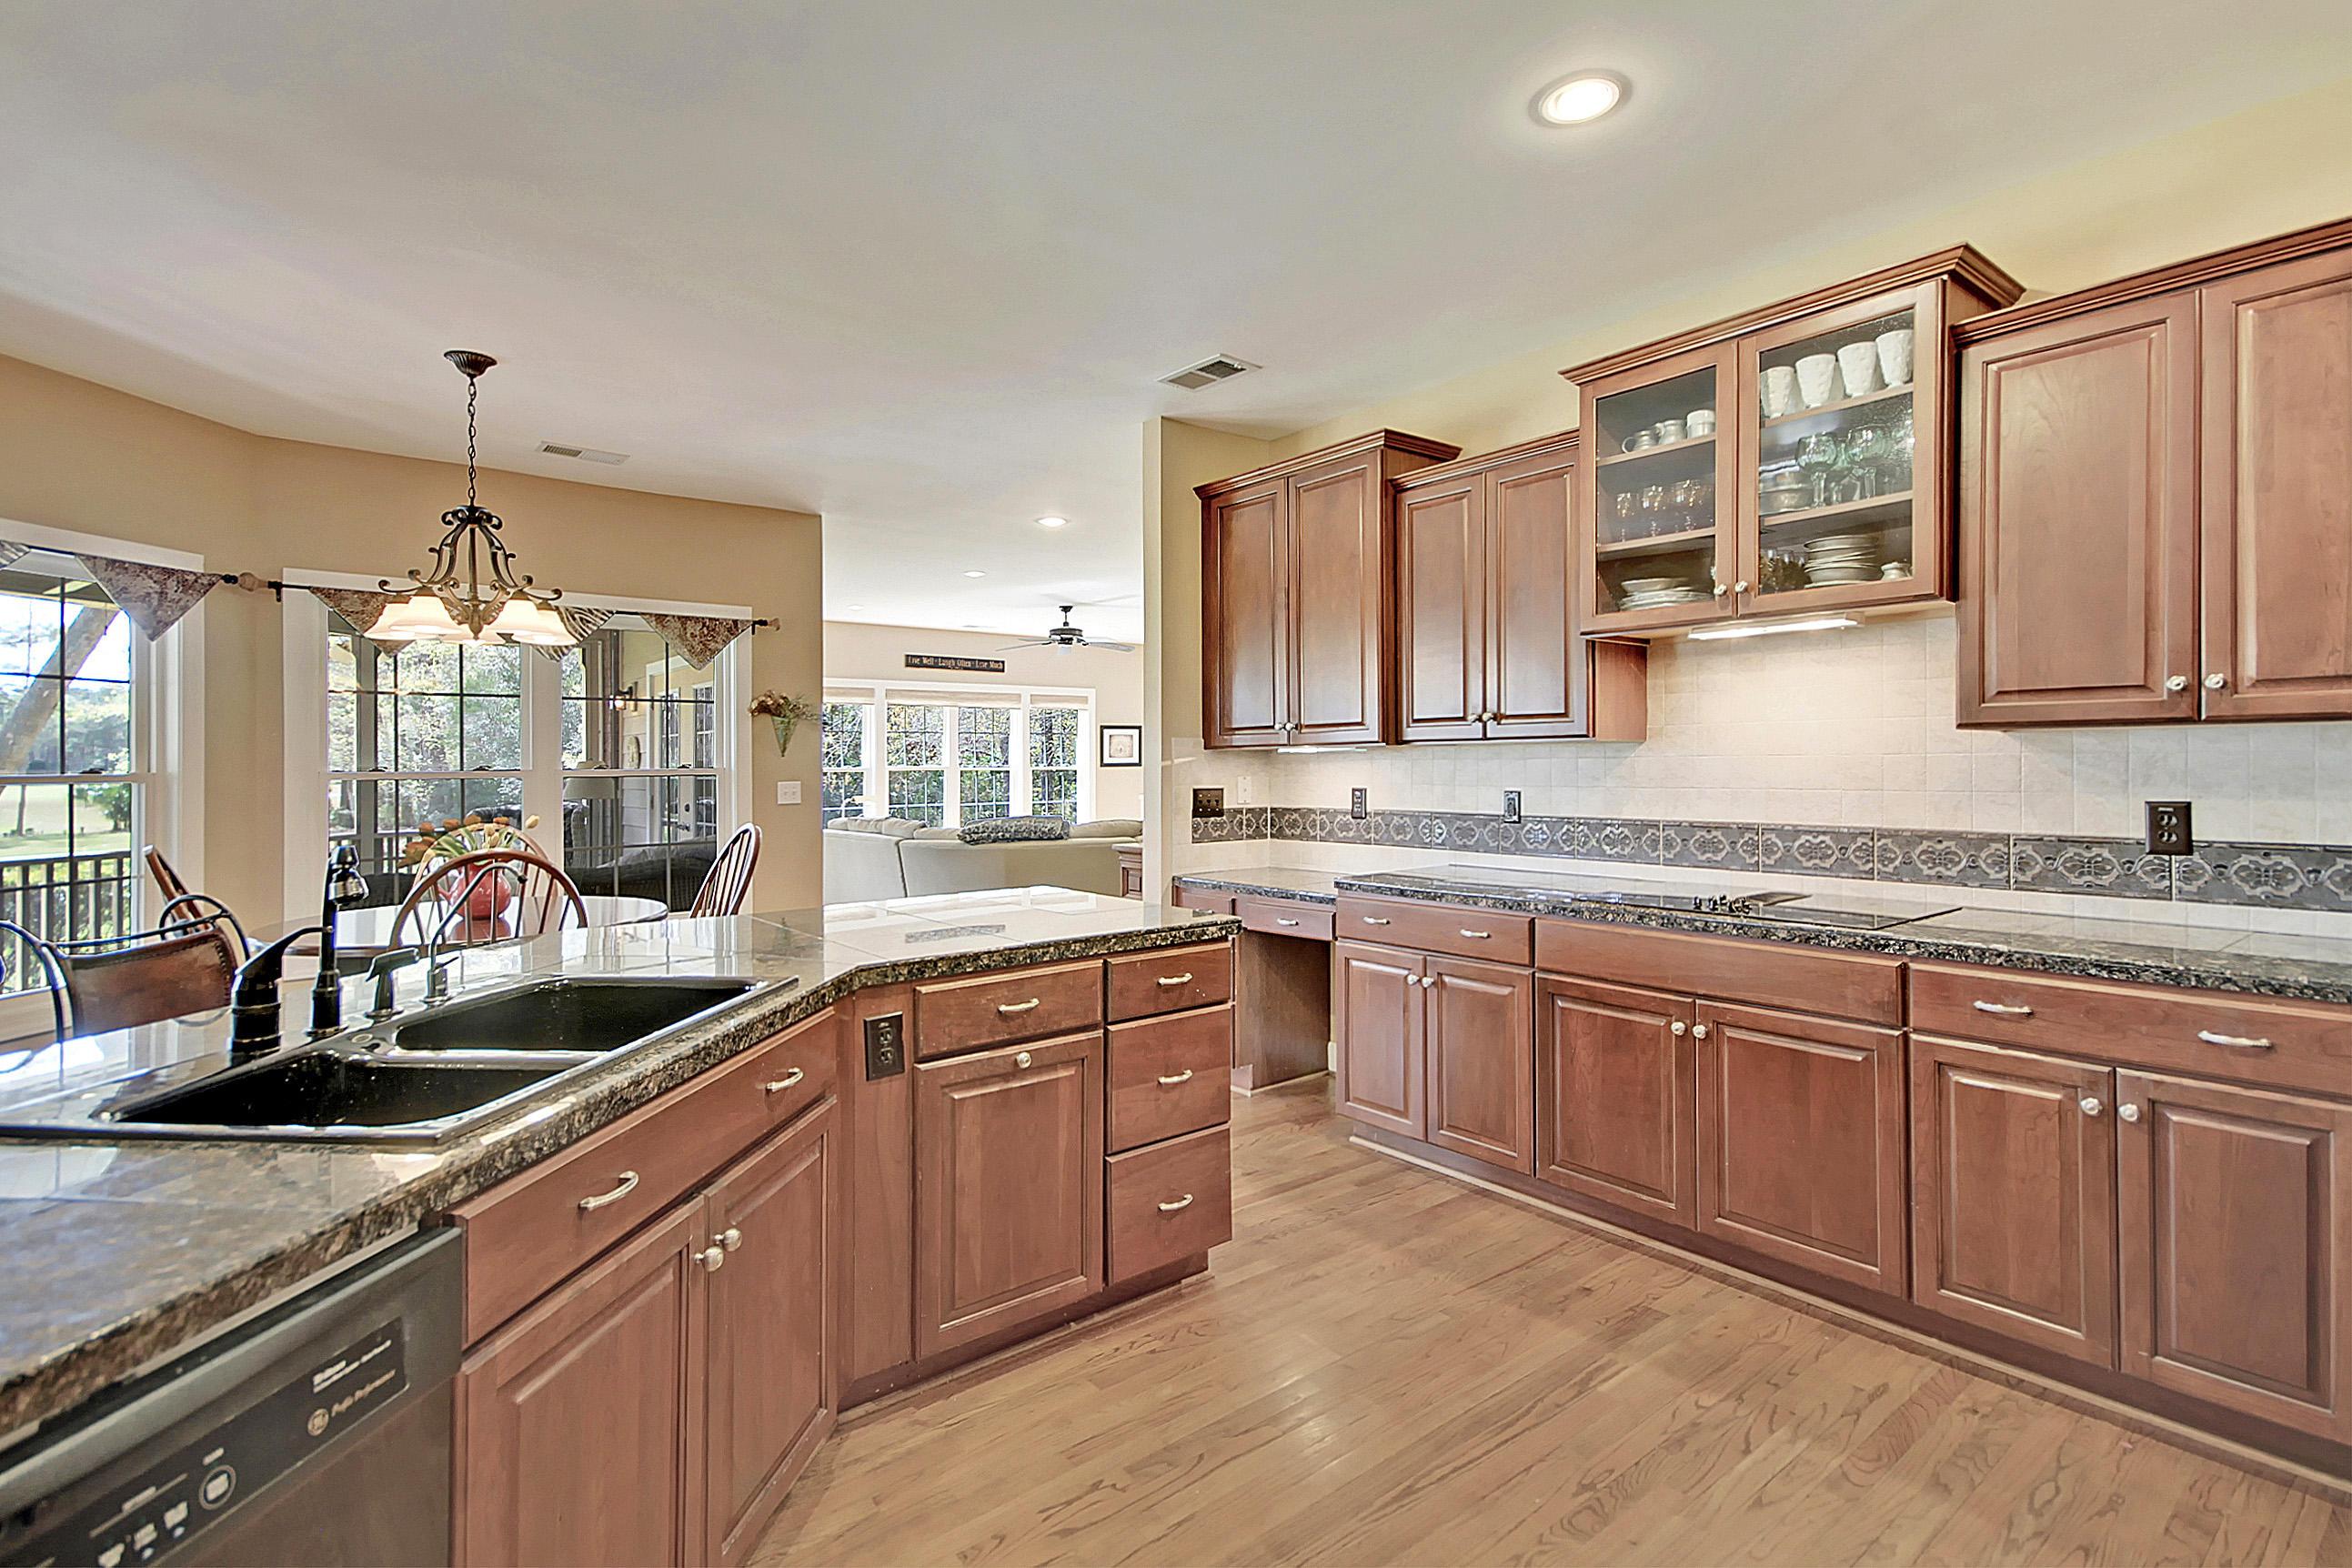 Dunes West Homes For Sale - 4002 Colonel Vanderhorst, Mount Pleasant, SC - 45